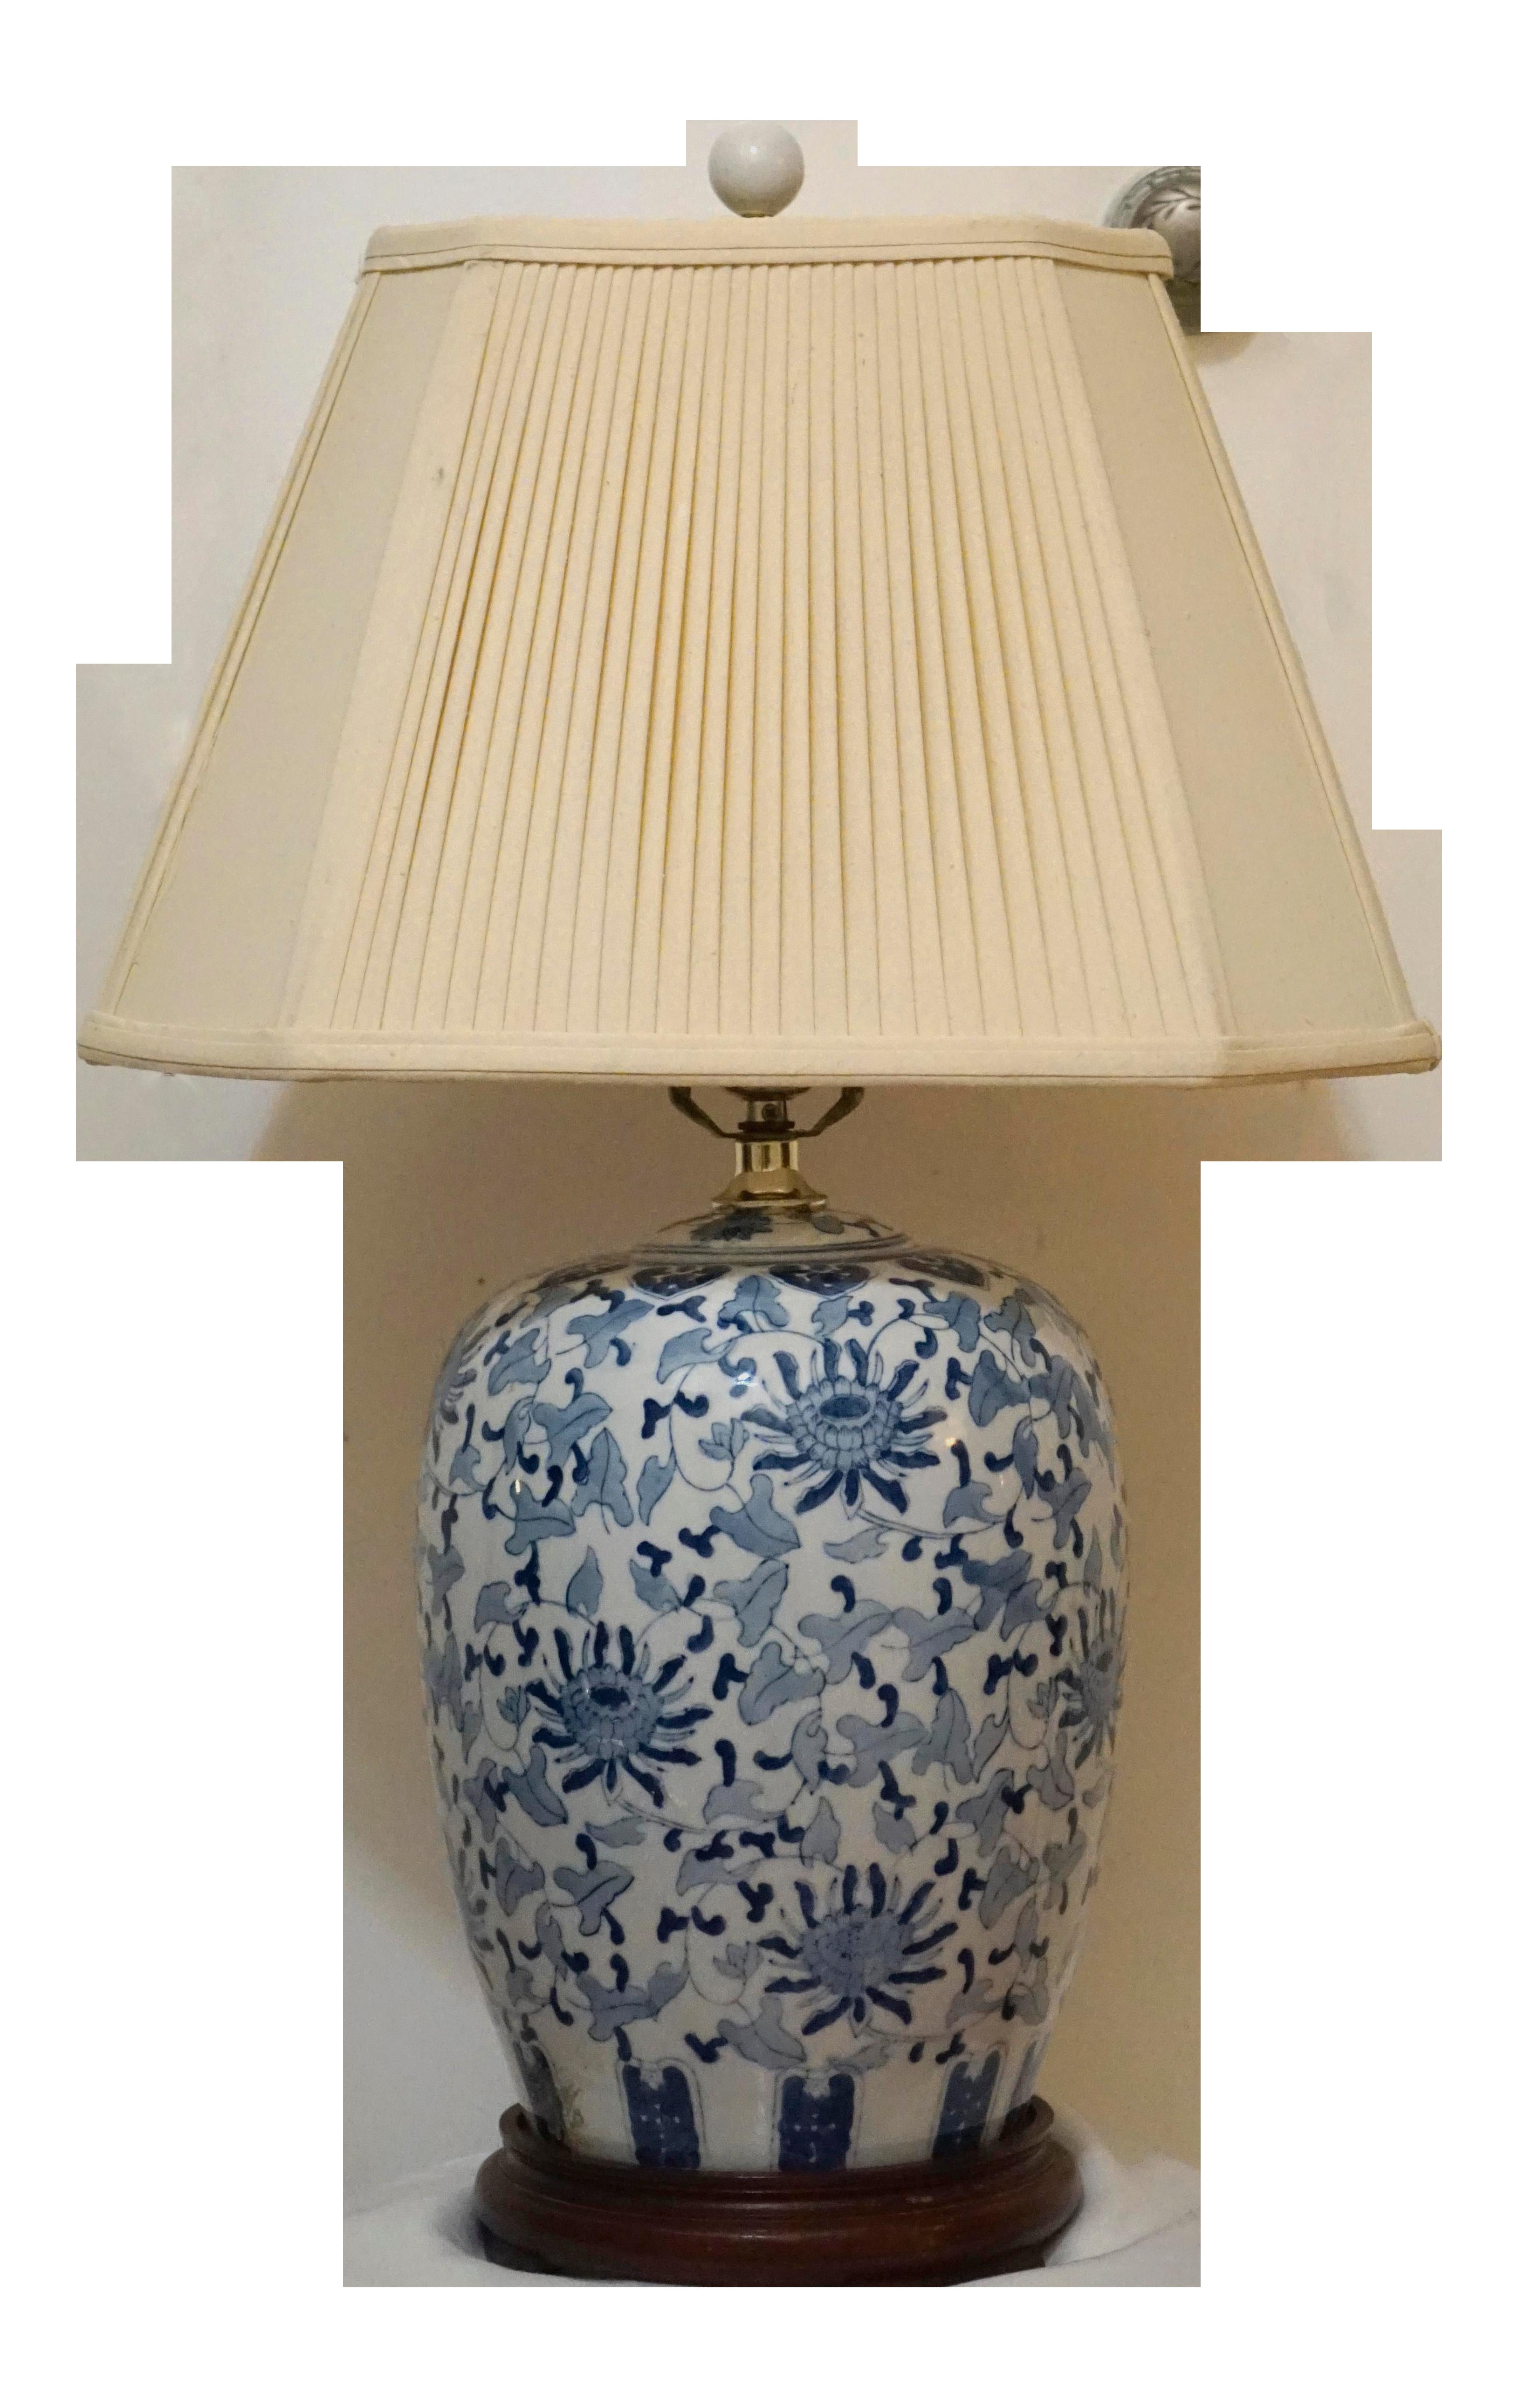 Blue And White Porcelain Chinese Ceramic Ginger Jar Lamp And Shade Ginger Jar Lamp Chinese Ceramics White Porcelain